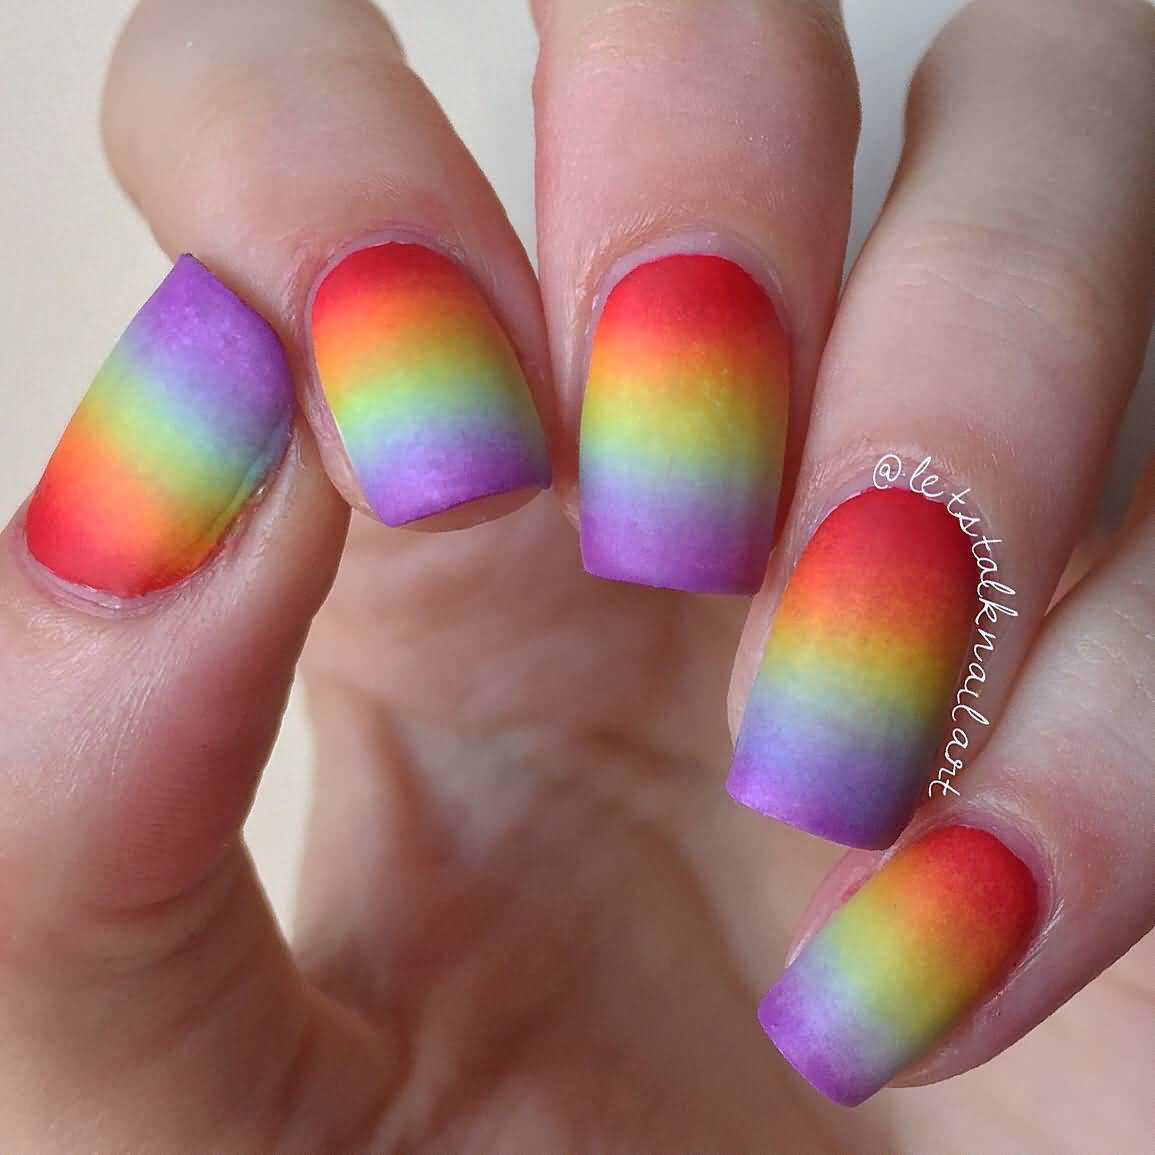 Rainbow Nail Art Designs: 17+ Adorable Rainbow Ombre Nail Art Design Ideas